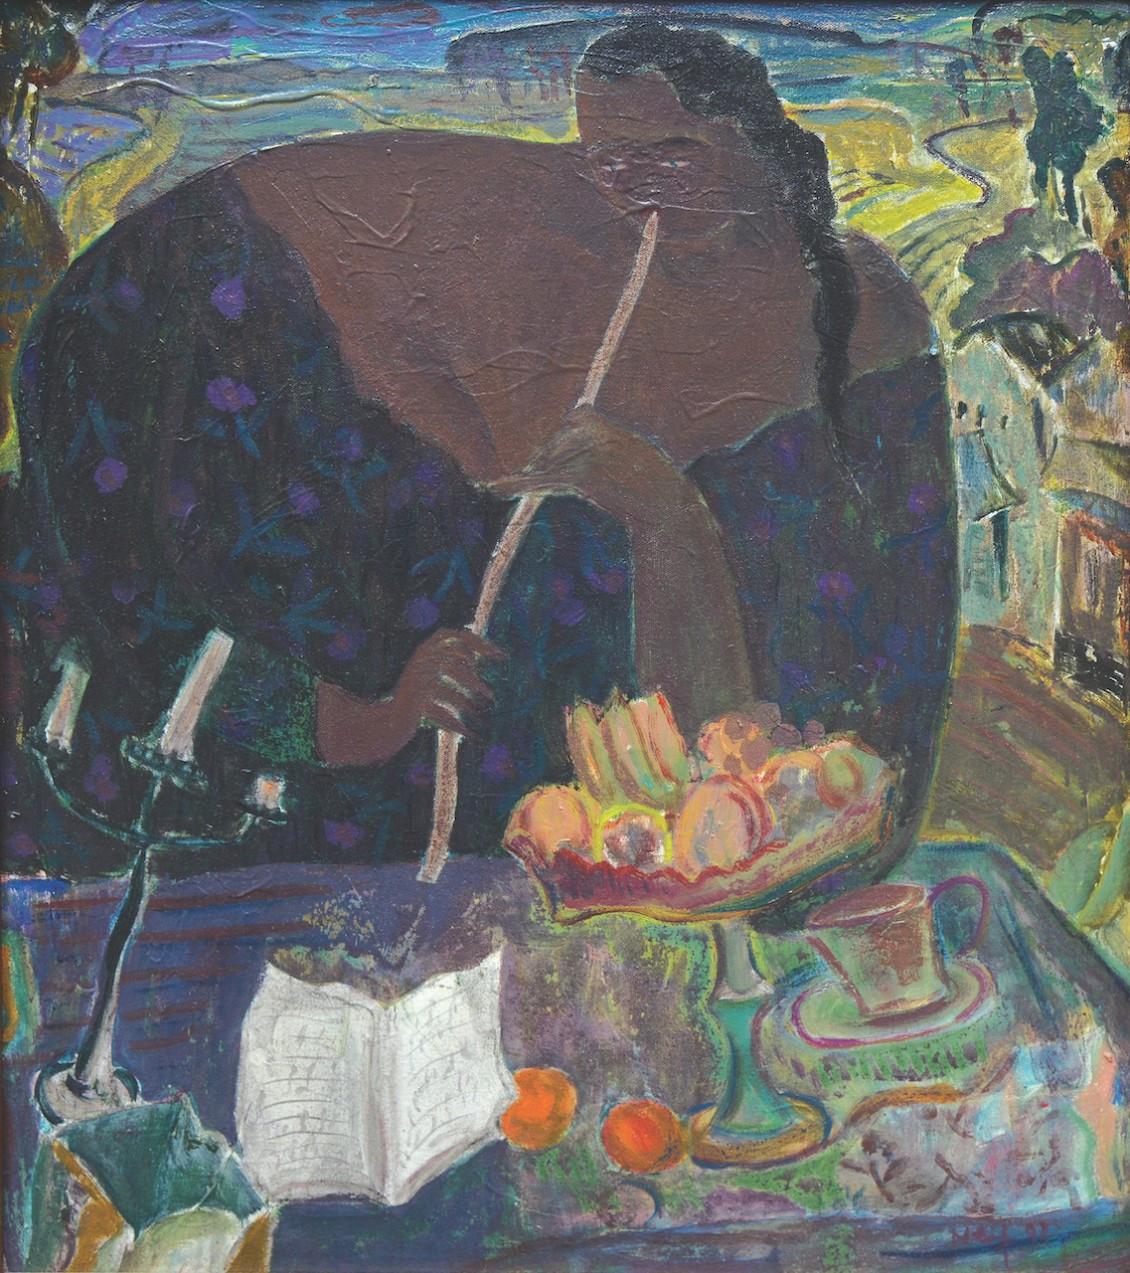 Lot 228 'The Flutist' (1993) by Arifien Nief, oil on canvas 45 x 40 cm